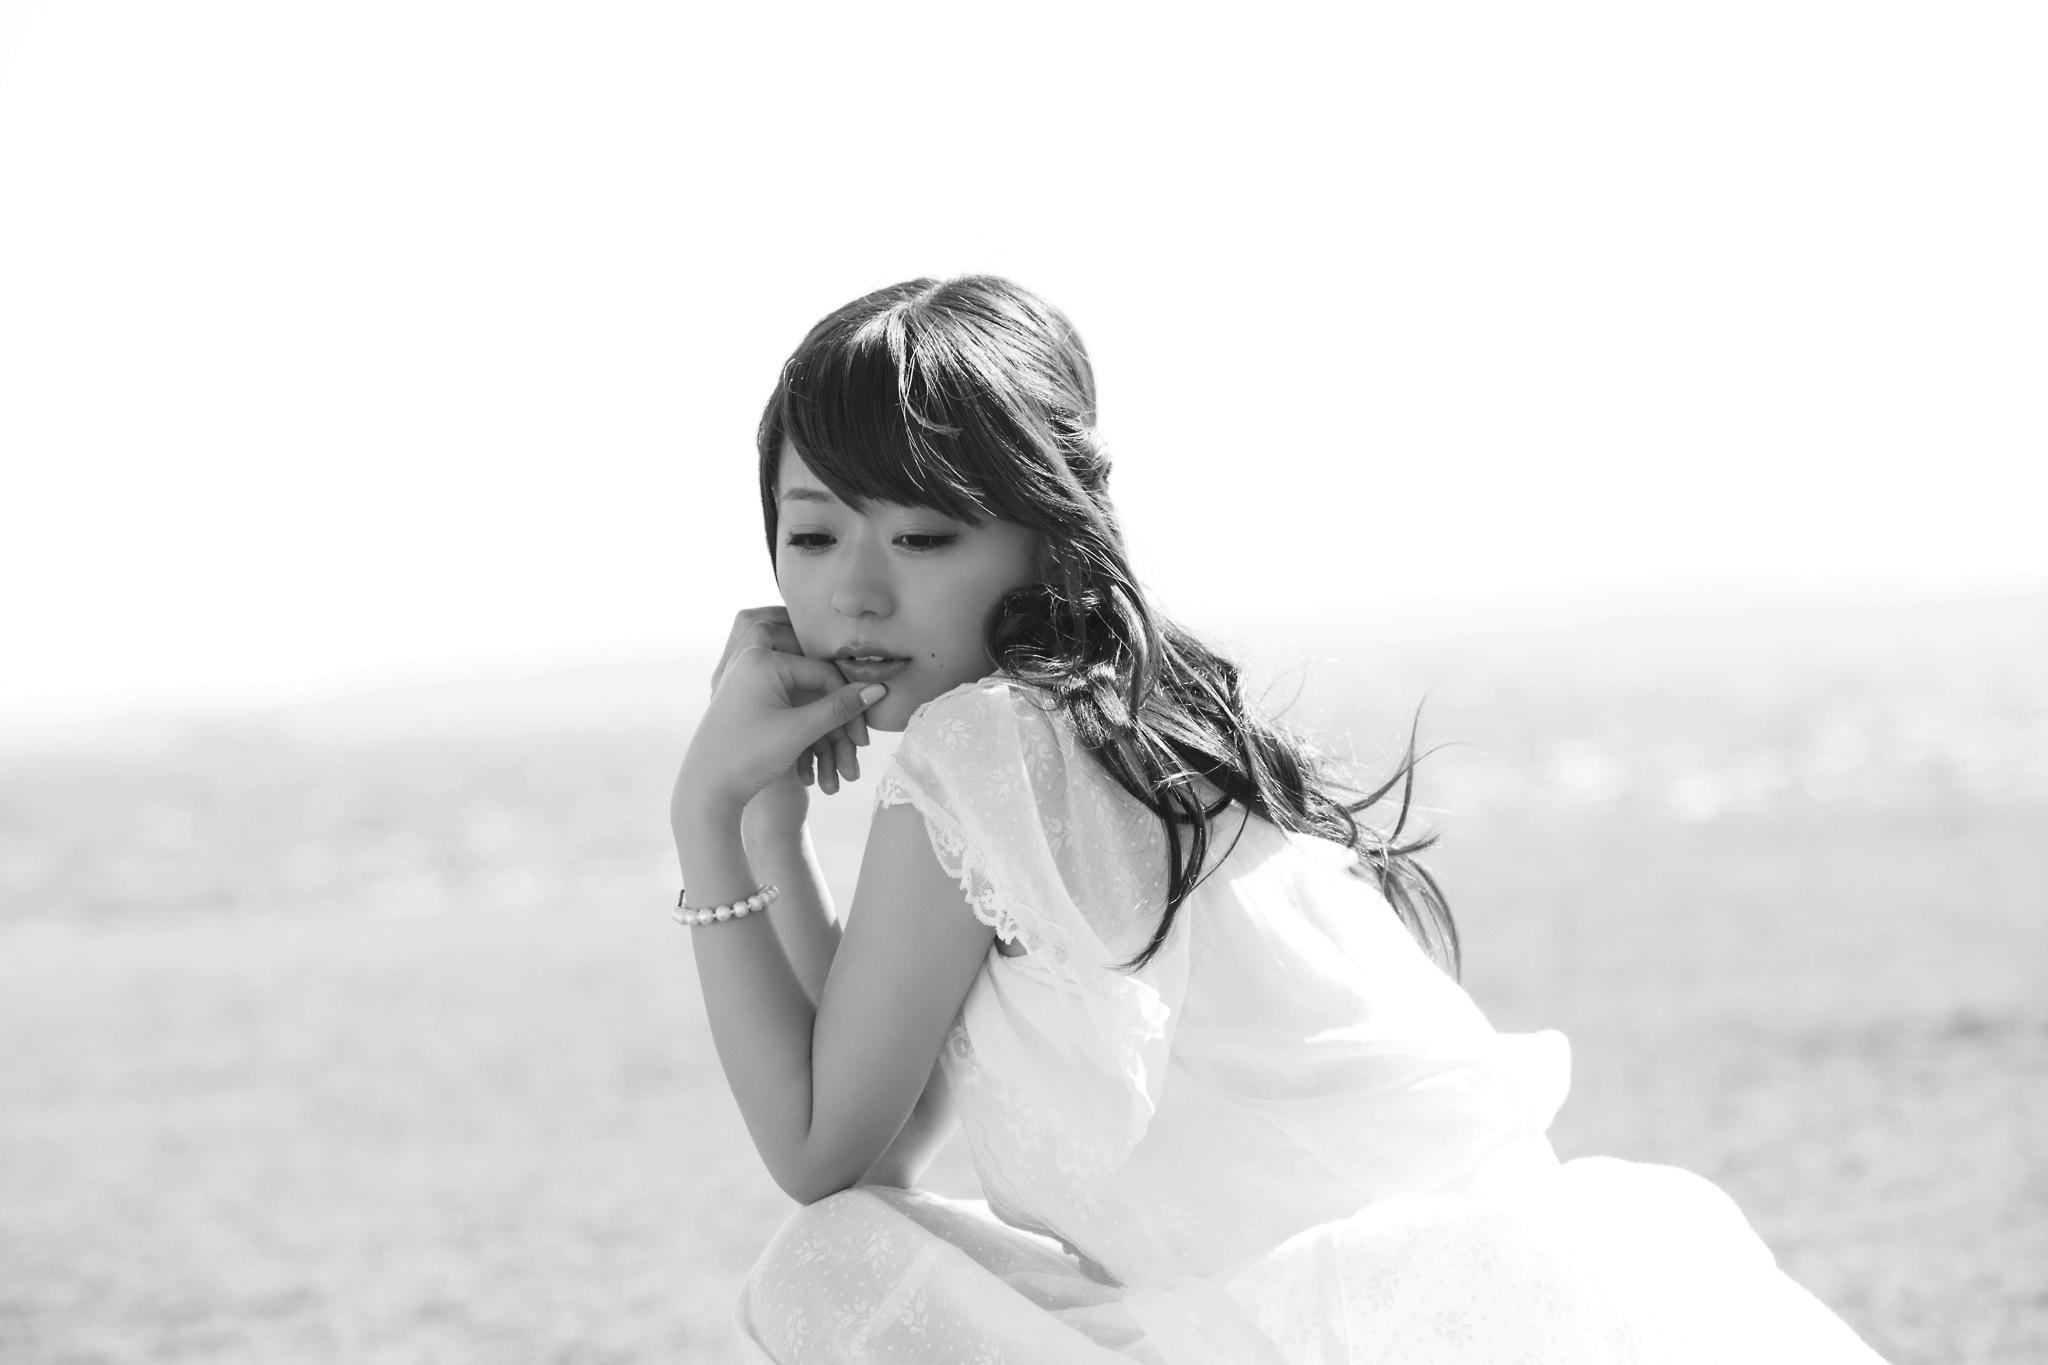 Tanaka Minami あなたを愛しただけでkonozamaだ